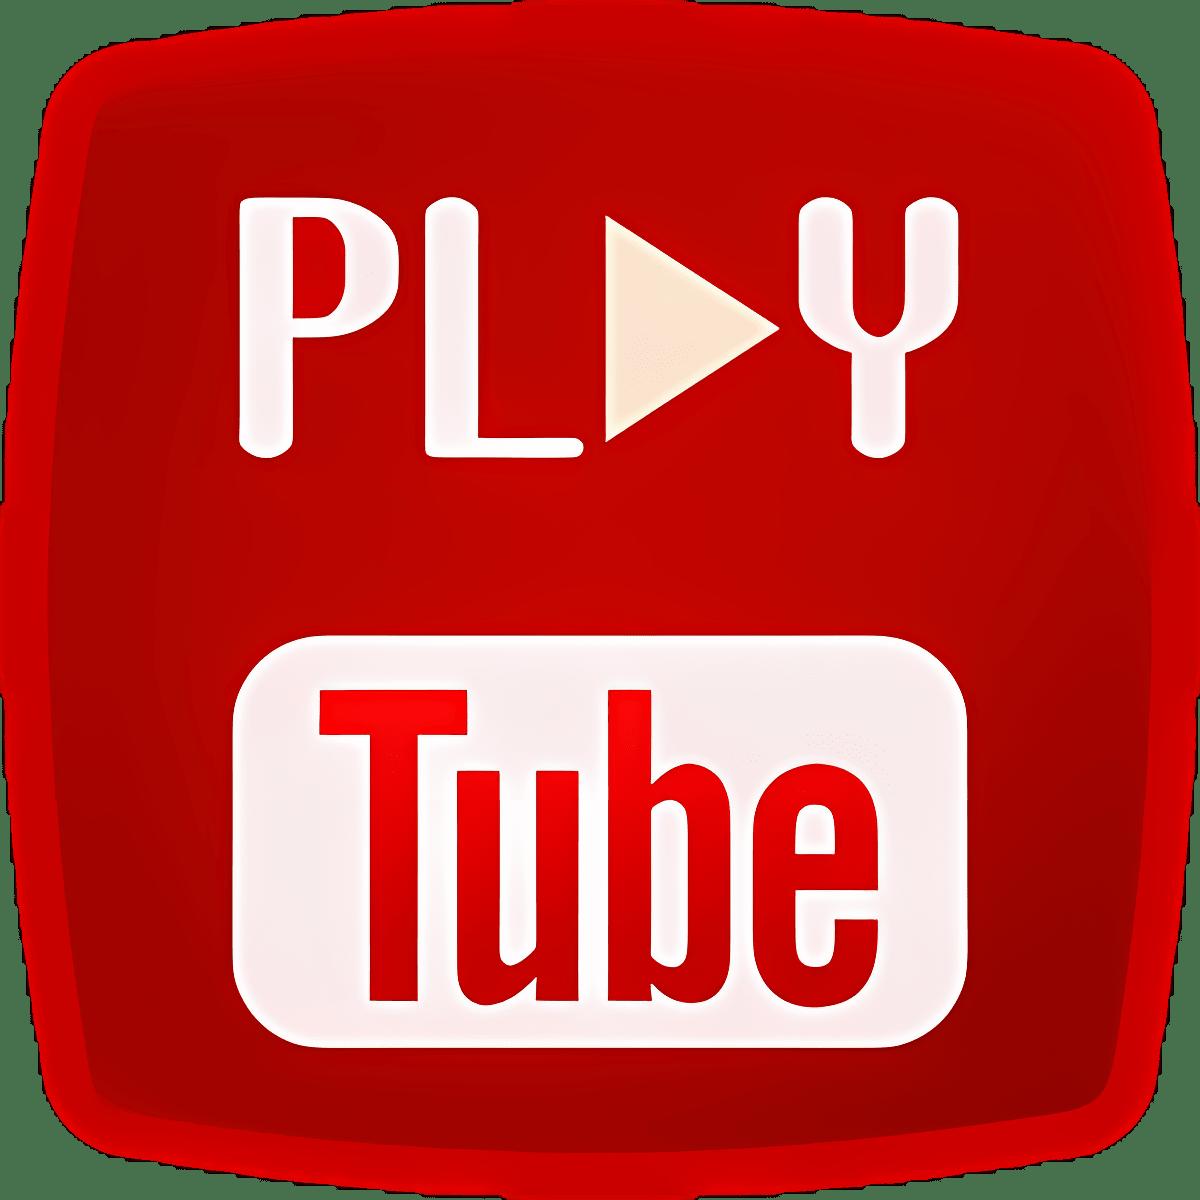 Play Tube Free